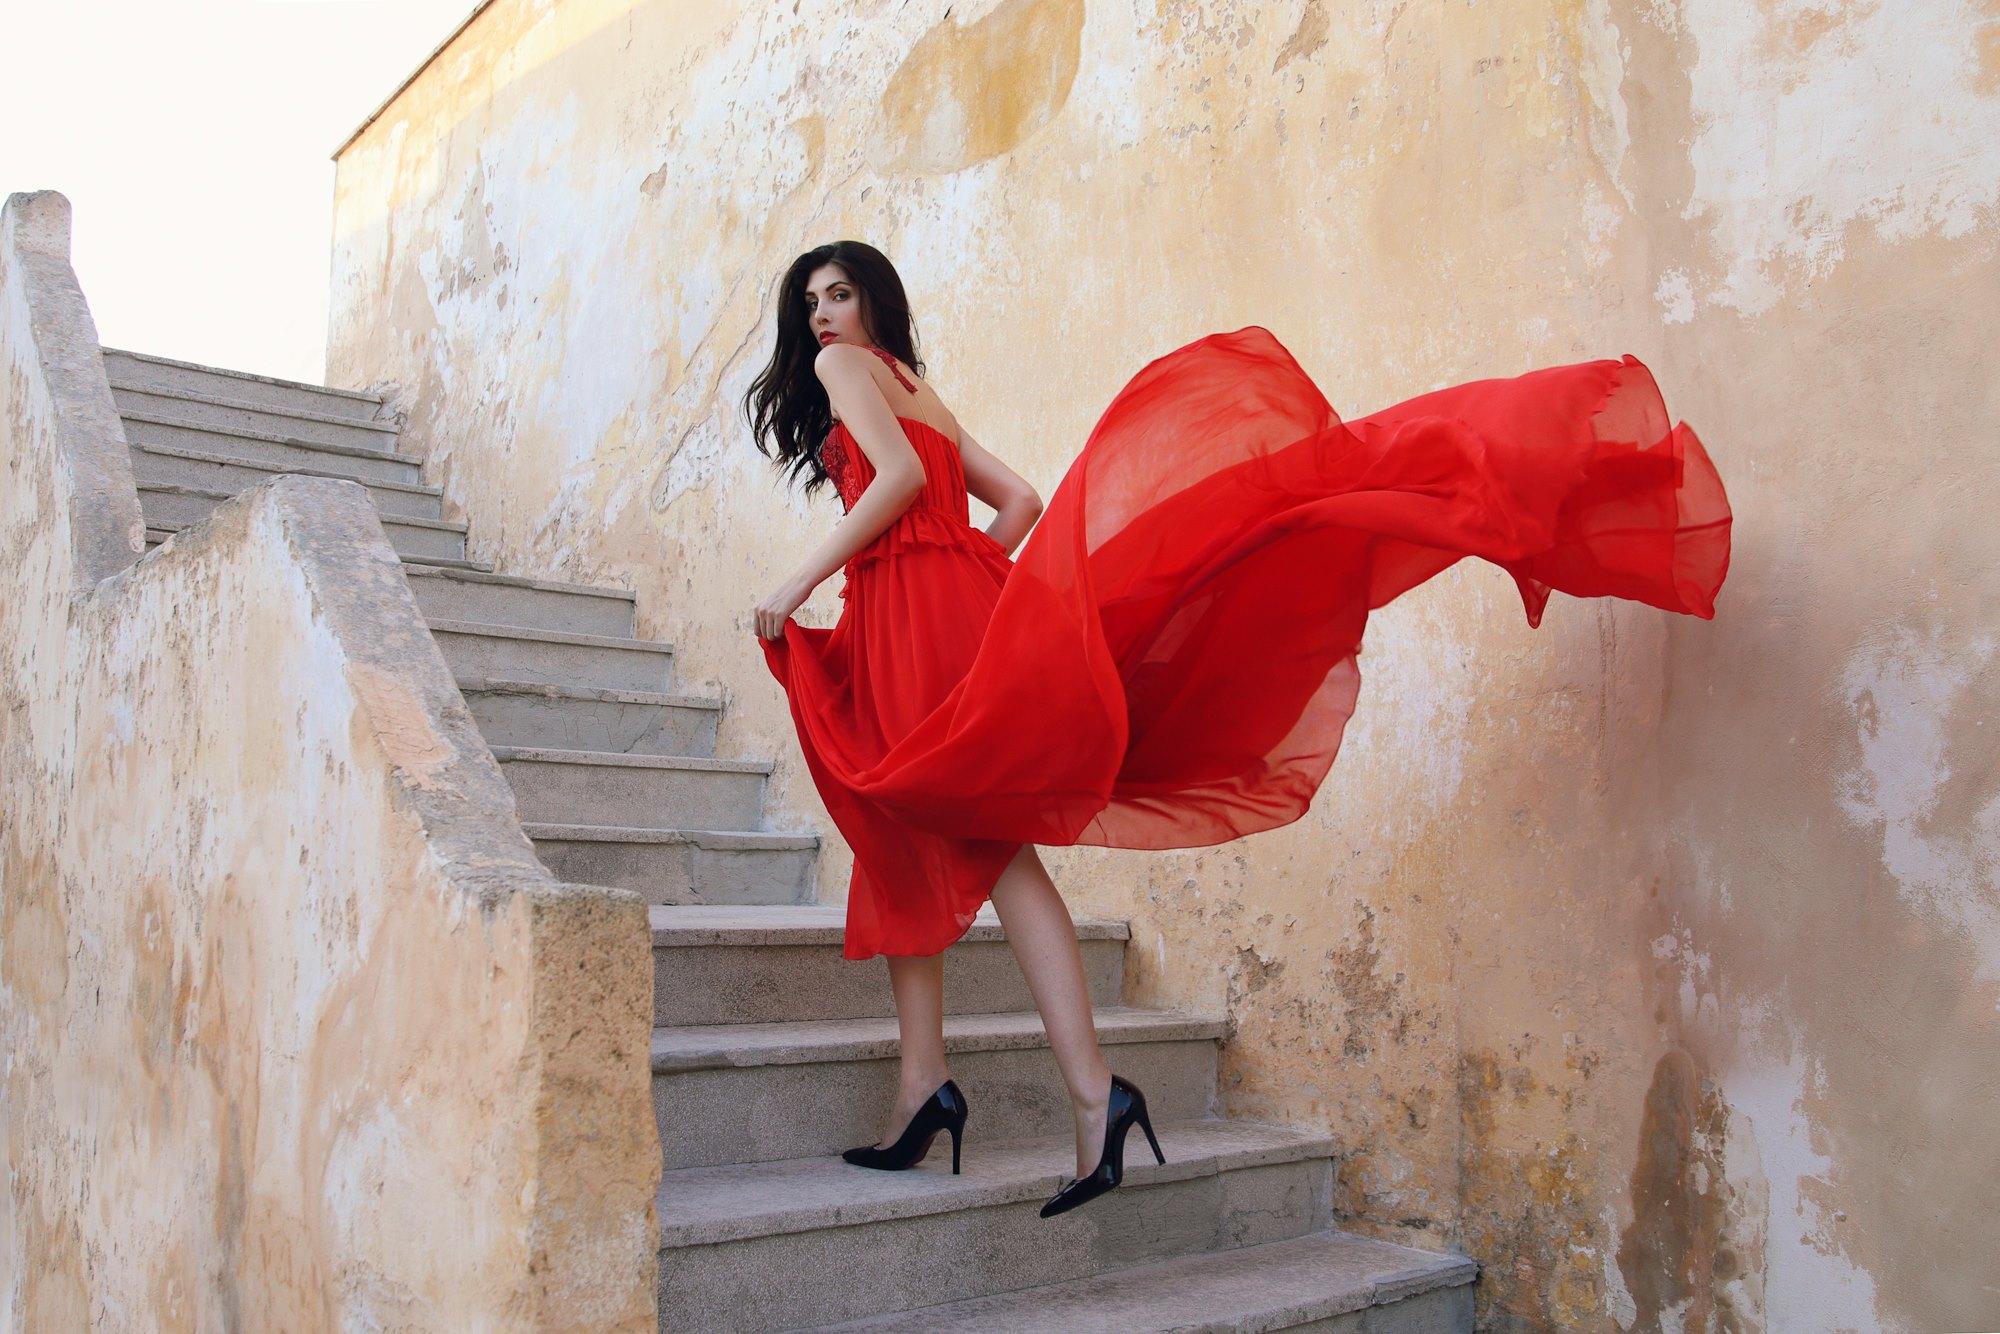 Miss Mondo Italia 2018 - Model